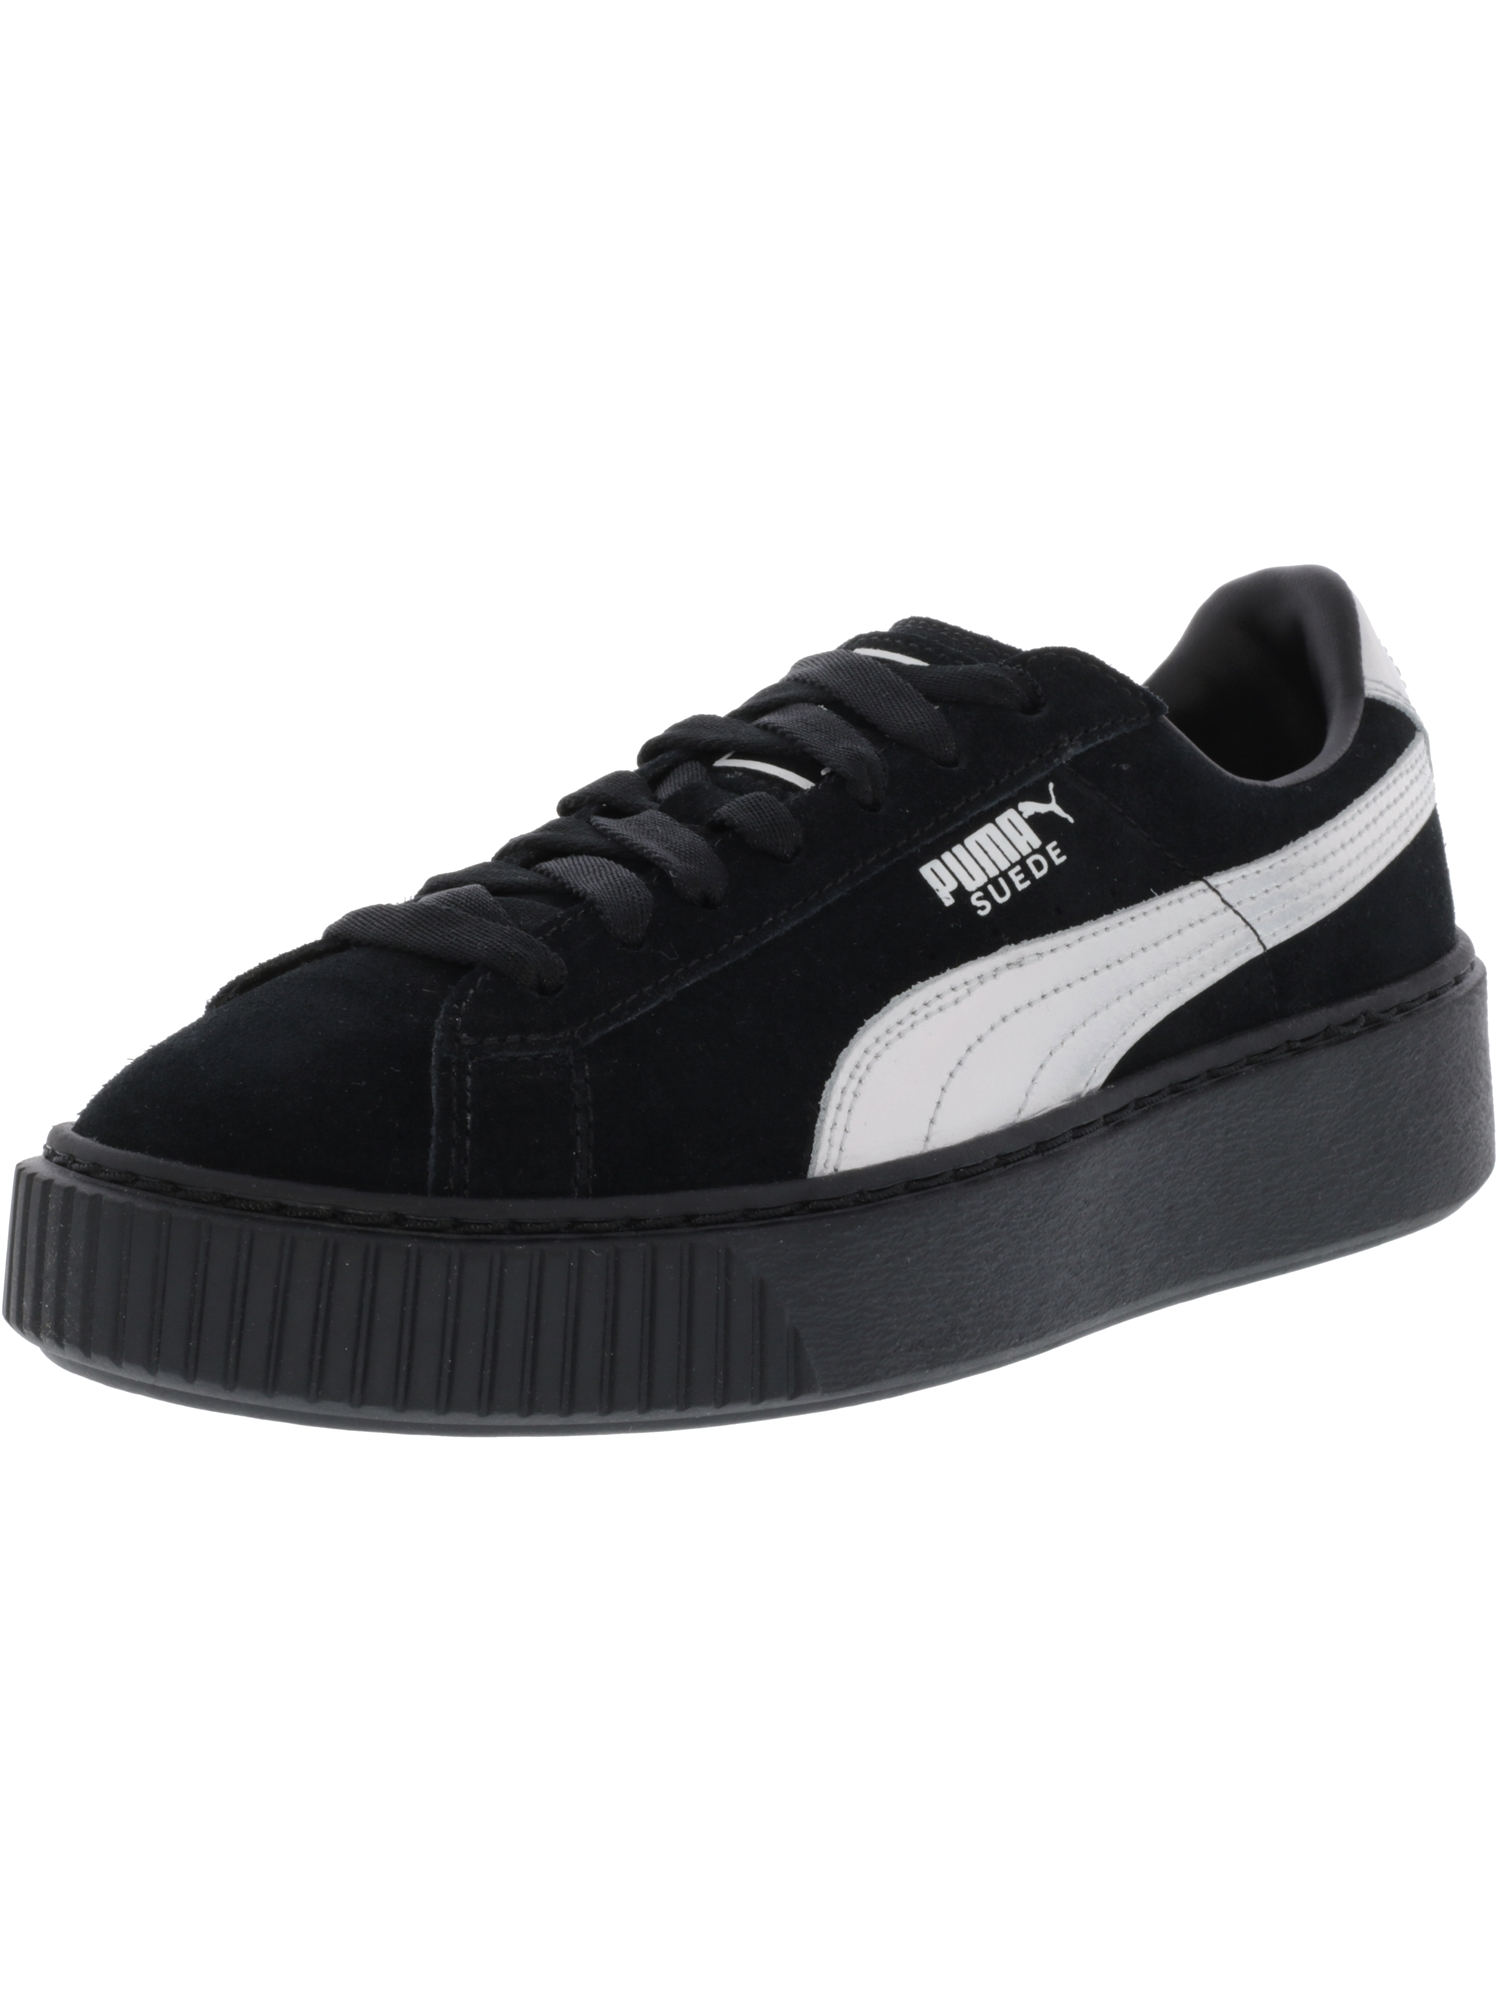 puma all black womens sneakers